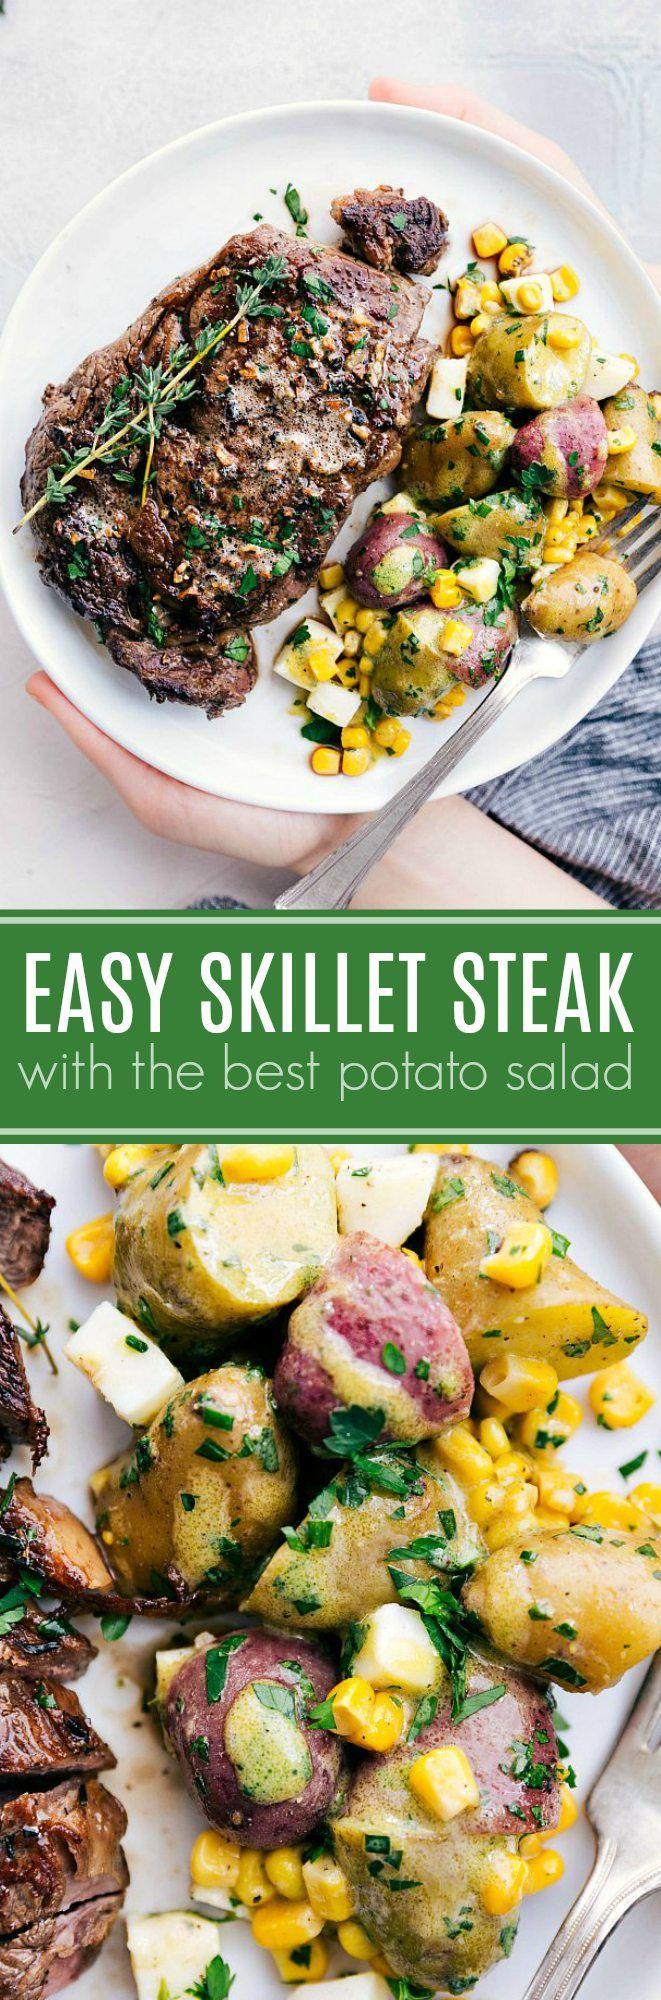 Skillet Steak with Potato Salad   Posted By: DebbieNet.com